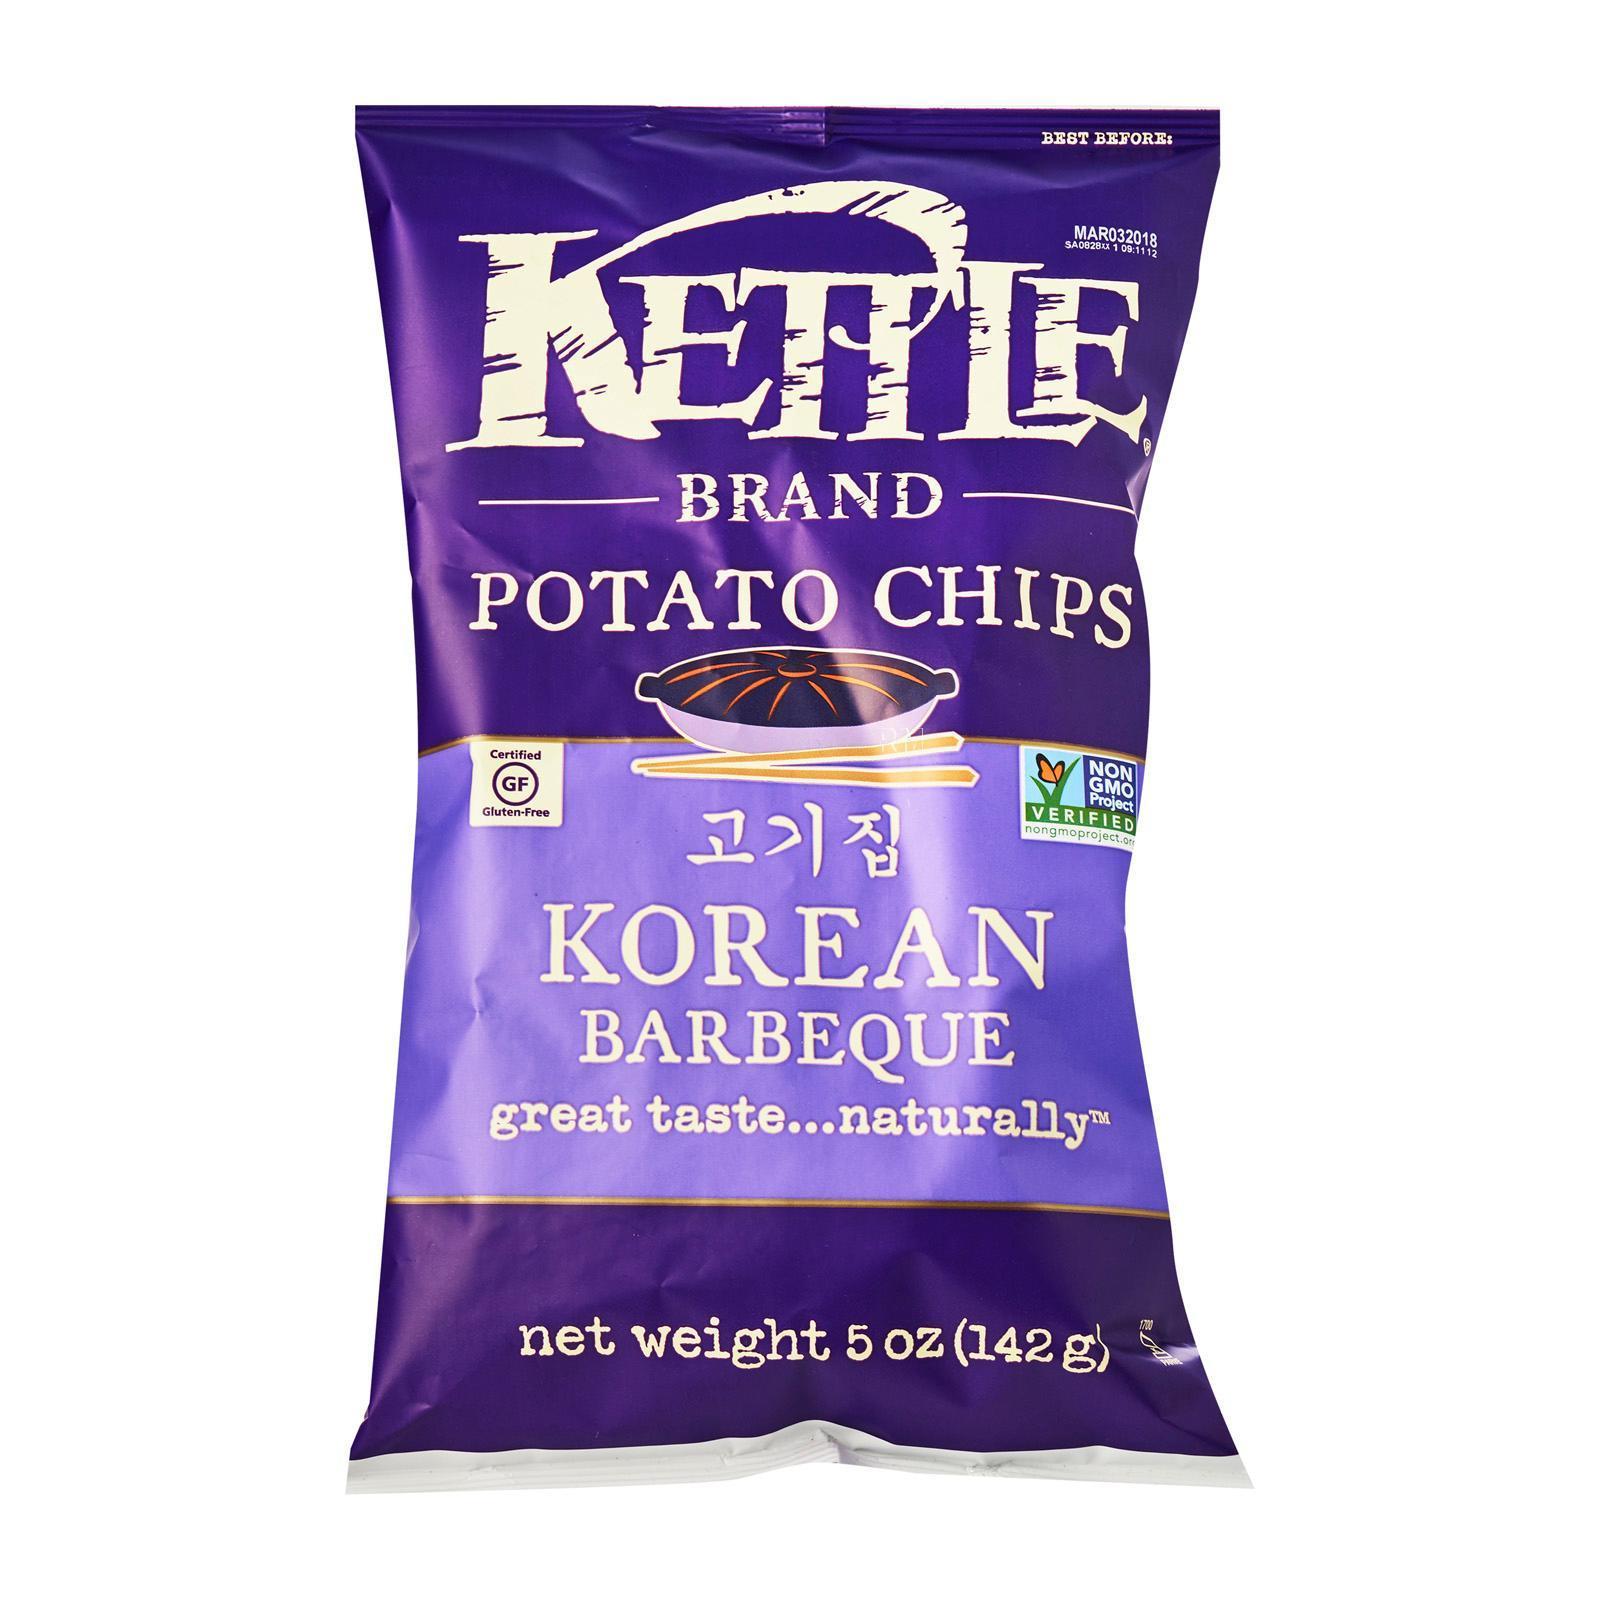 Kettle Brand Potato Chips - Backyard Barbeque